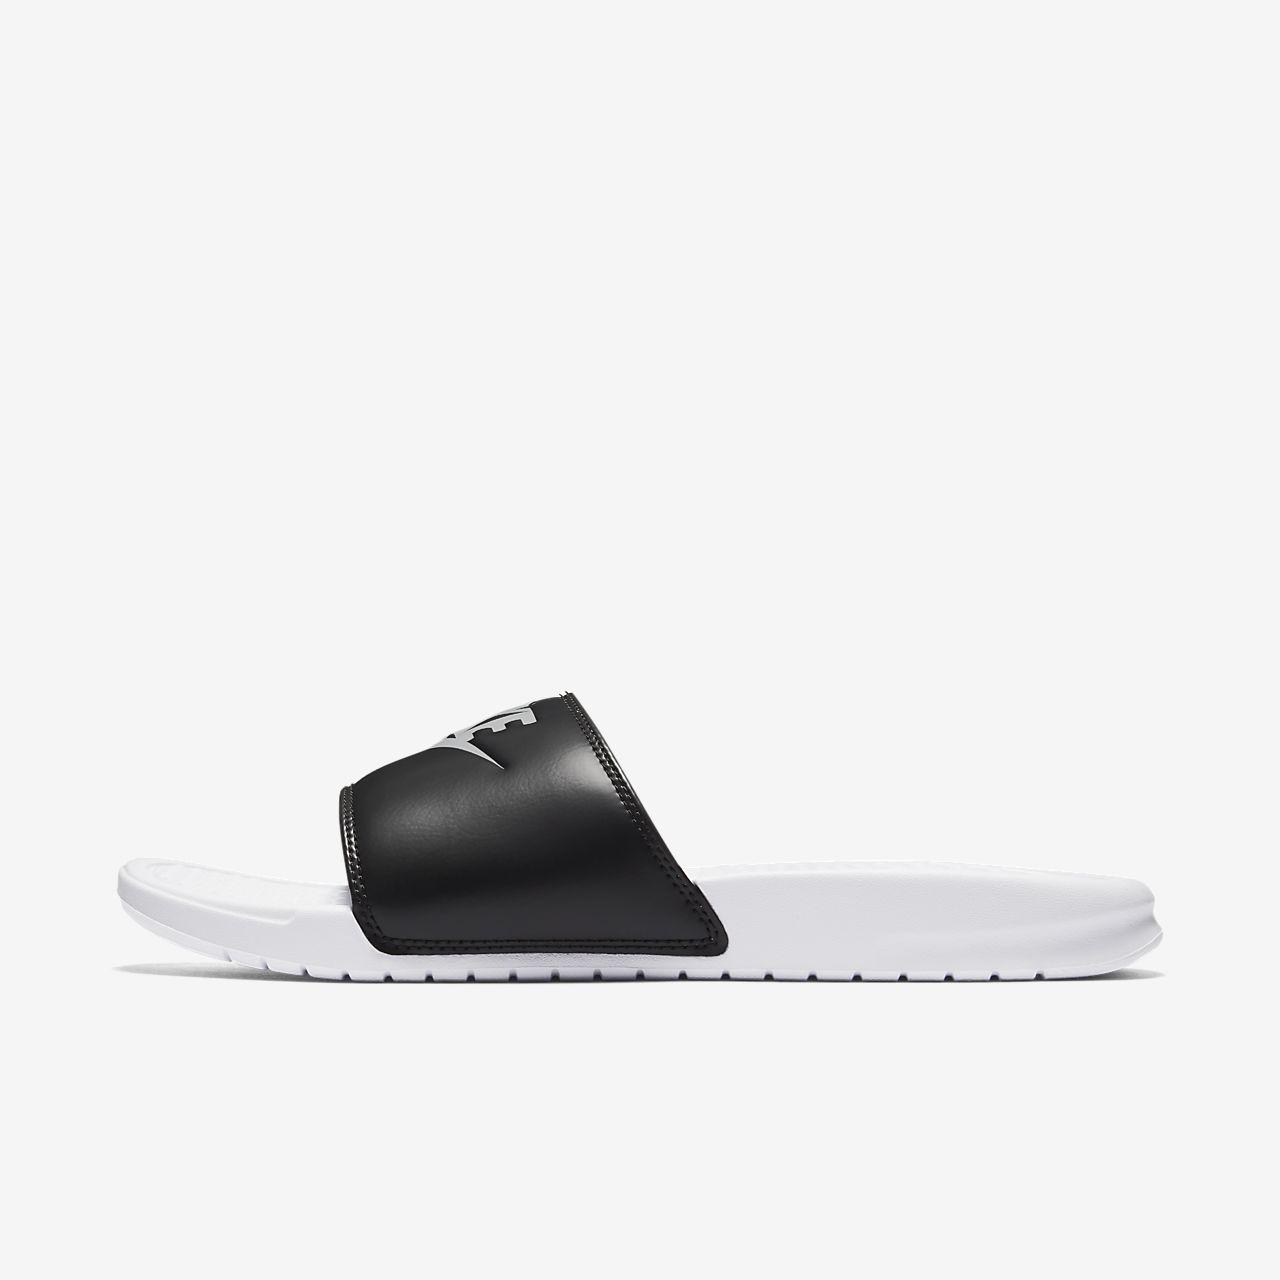 Low Resolution Nike Benassi Men's Slide Nike Benassi Men's Slide